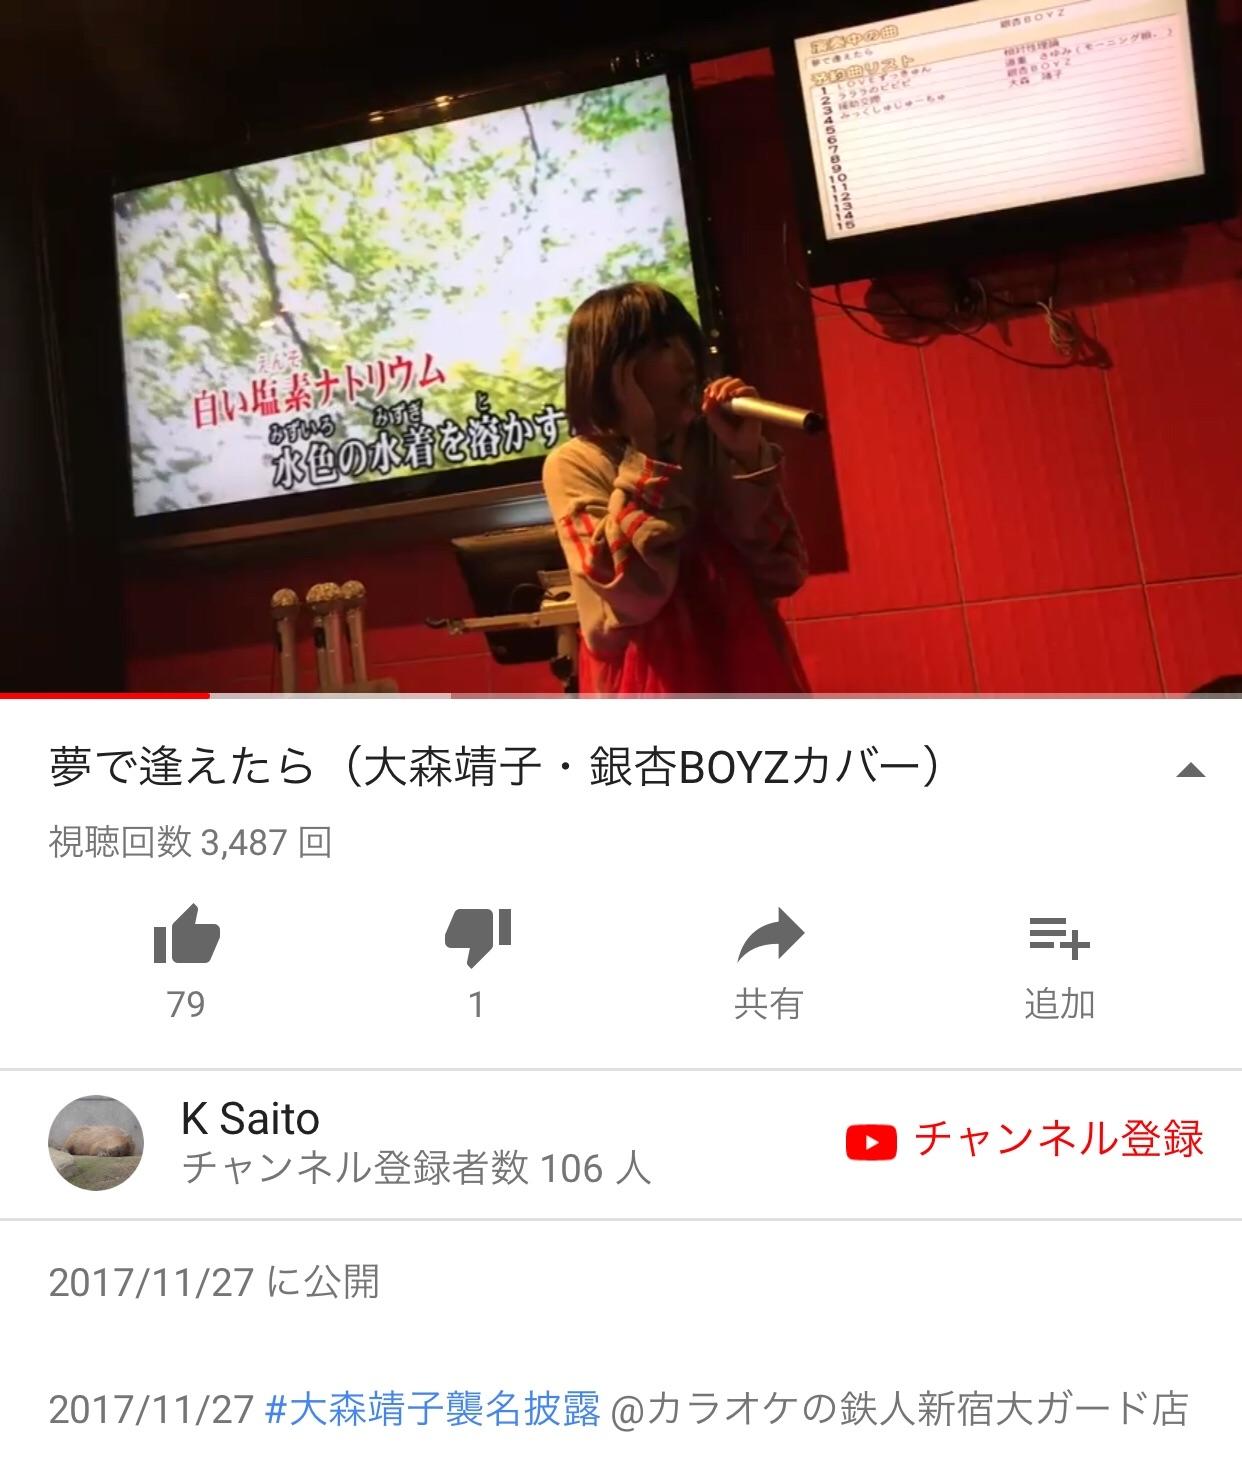 f:id:mushimushi06:20171216231202j:image